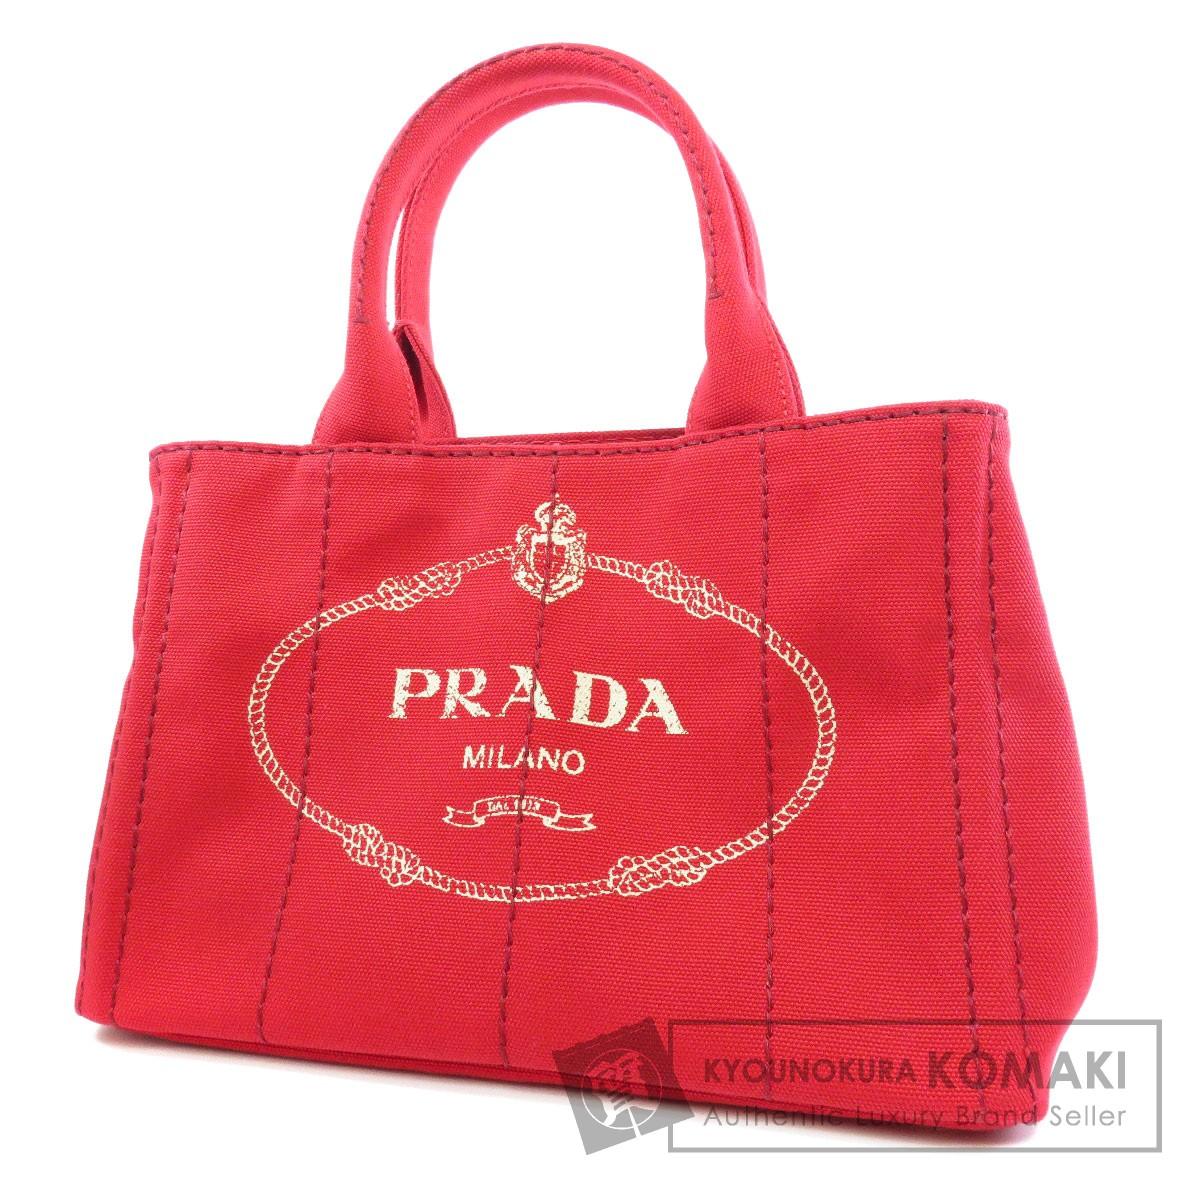 PRADA 1BG439 カナパ ミニ 2way ハンドバッグ キャンバス レディース 【中古】【プラダ】